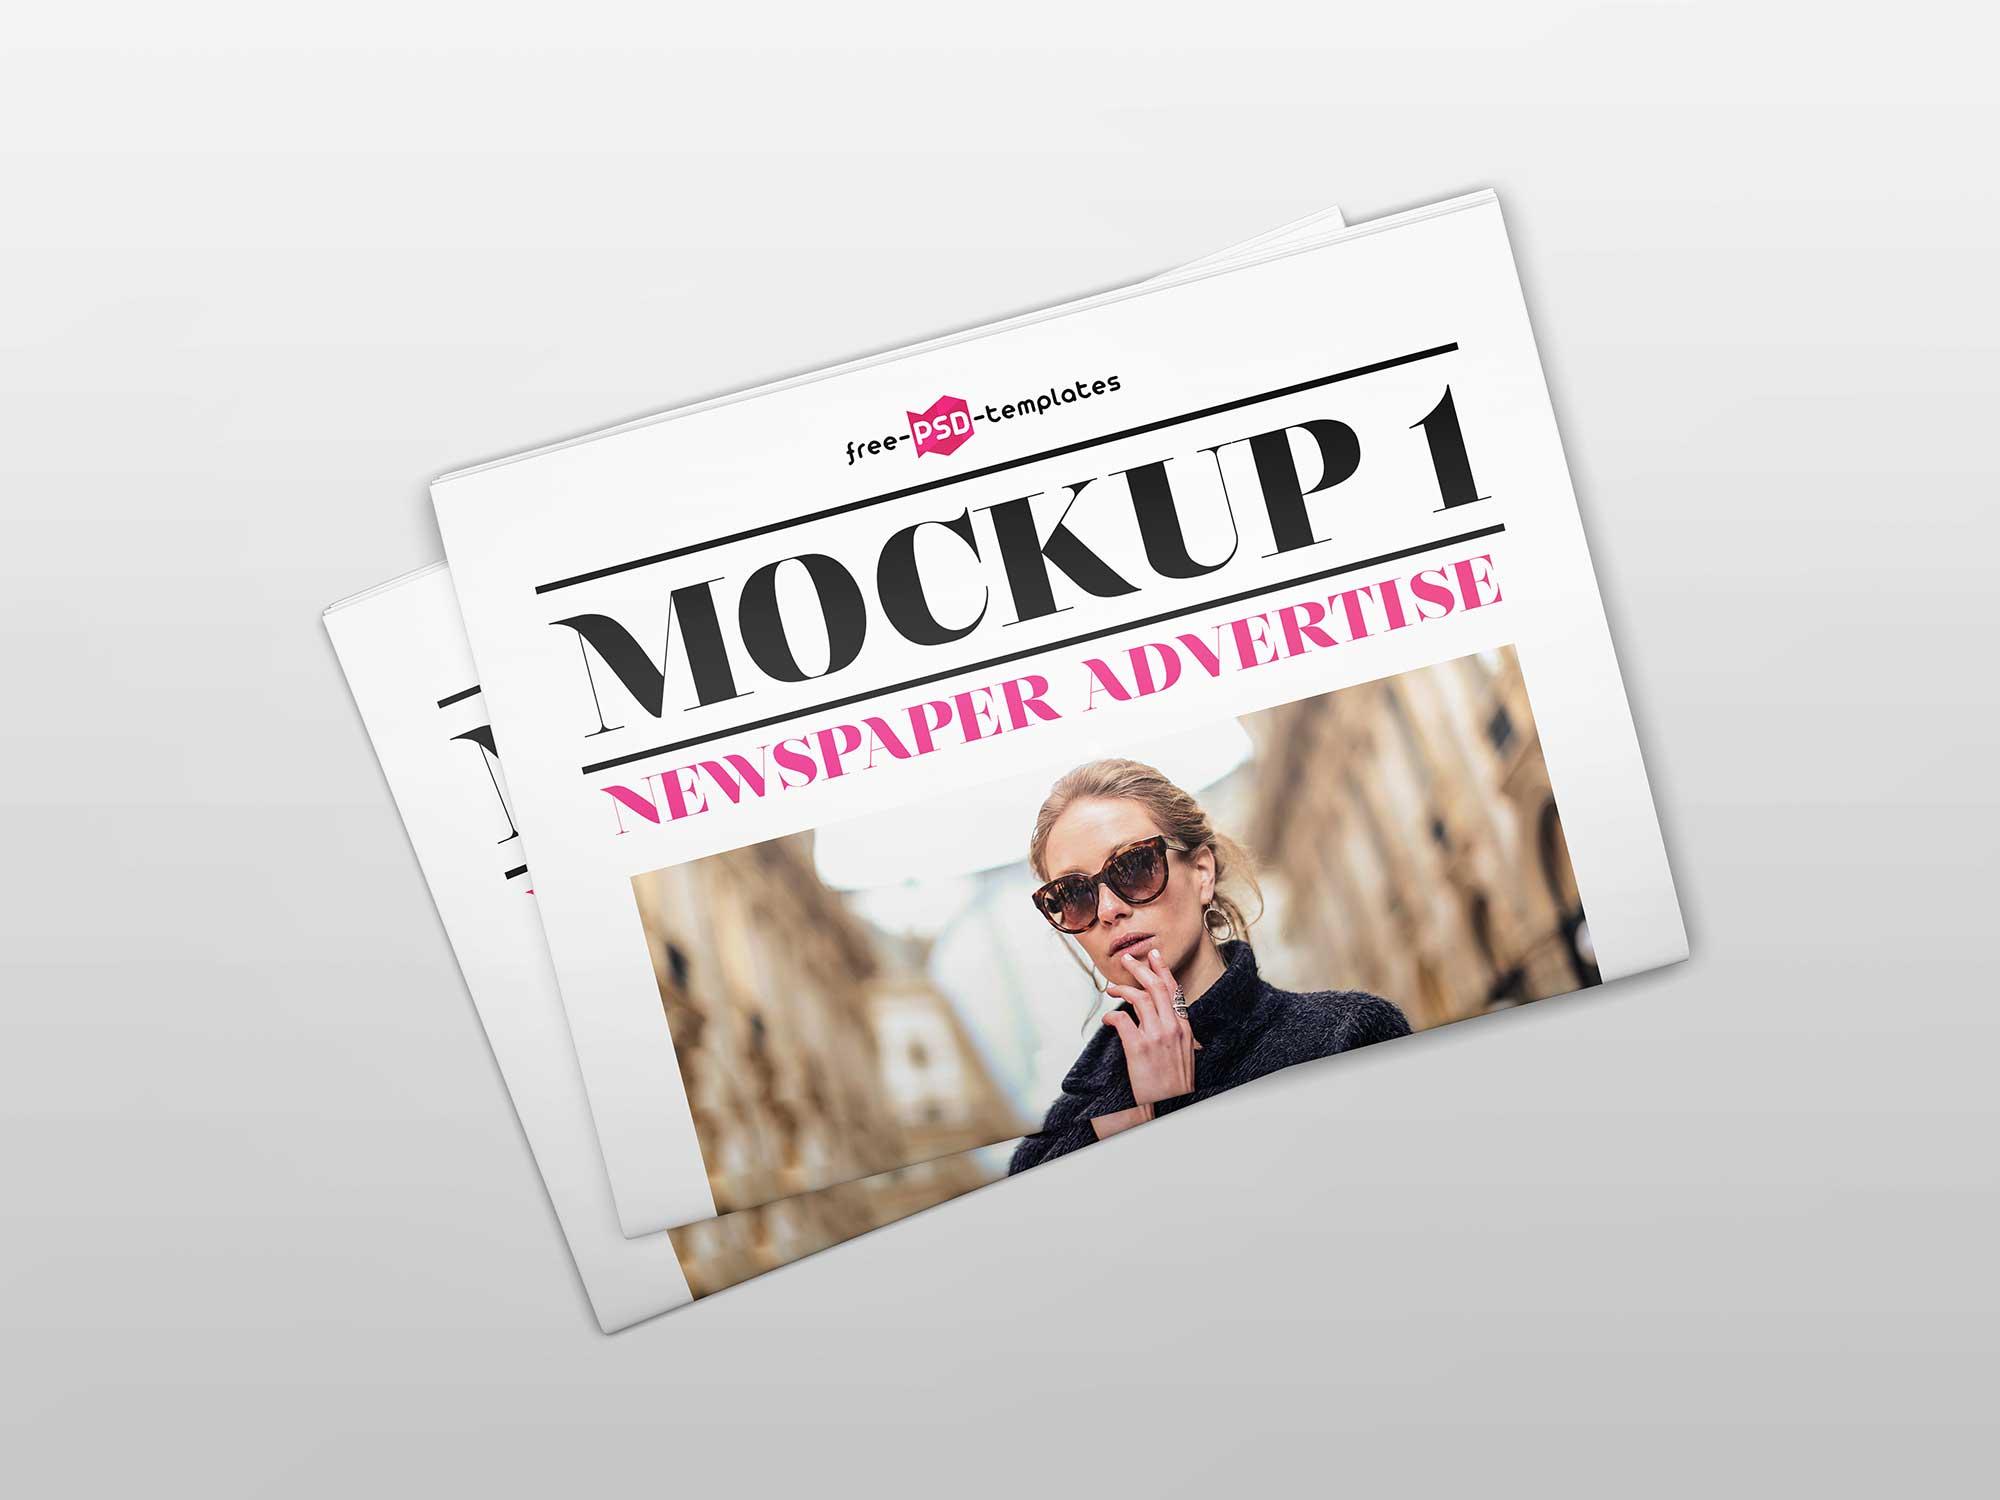 Newspaper Advertising Mockup 3